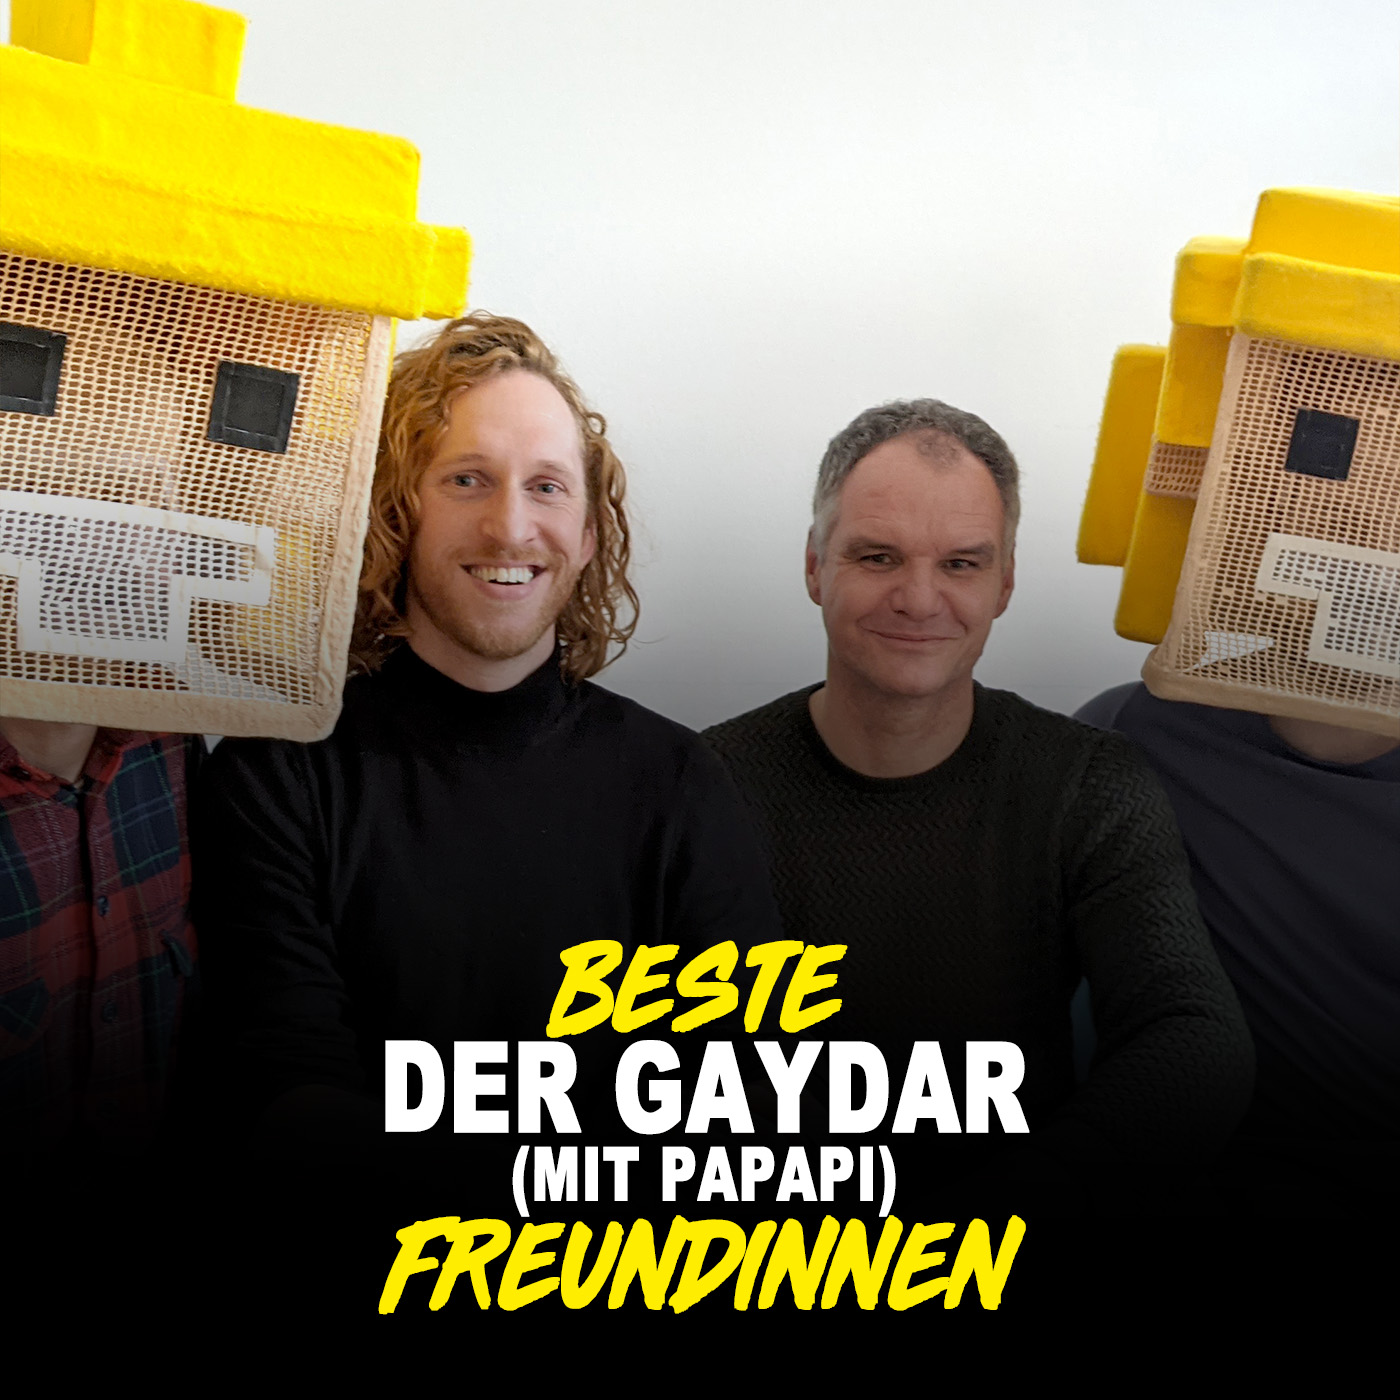 Der Gaydar (mit Papapi)